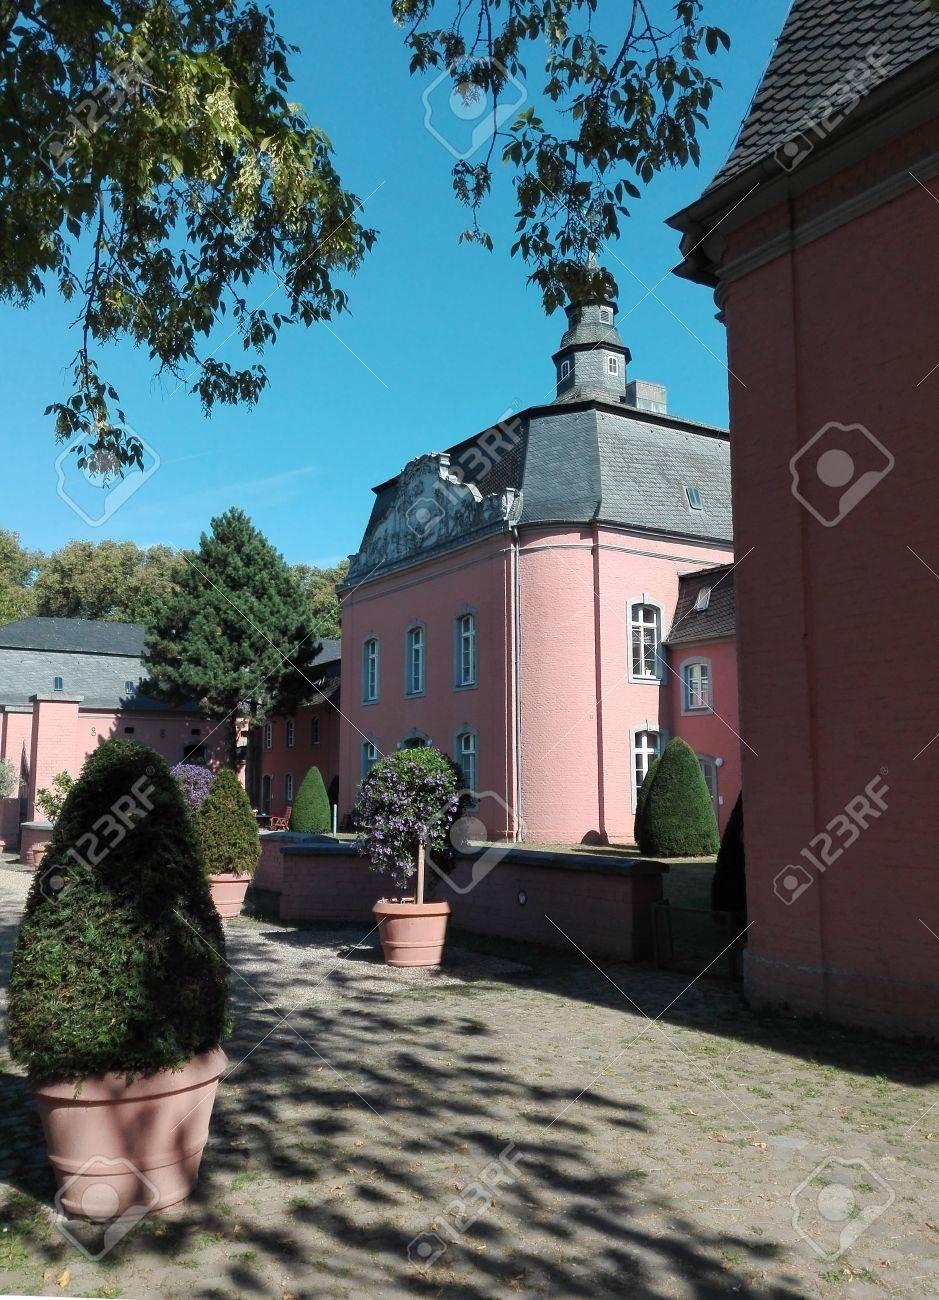 Castle Wickrath - Building of the castle of Castle Wickrath, Germany, Wickrath 10/12/2016 - 68769719